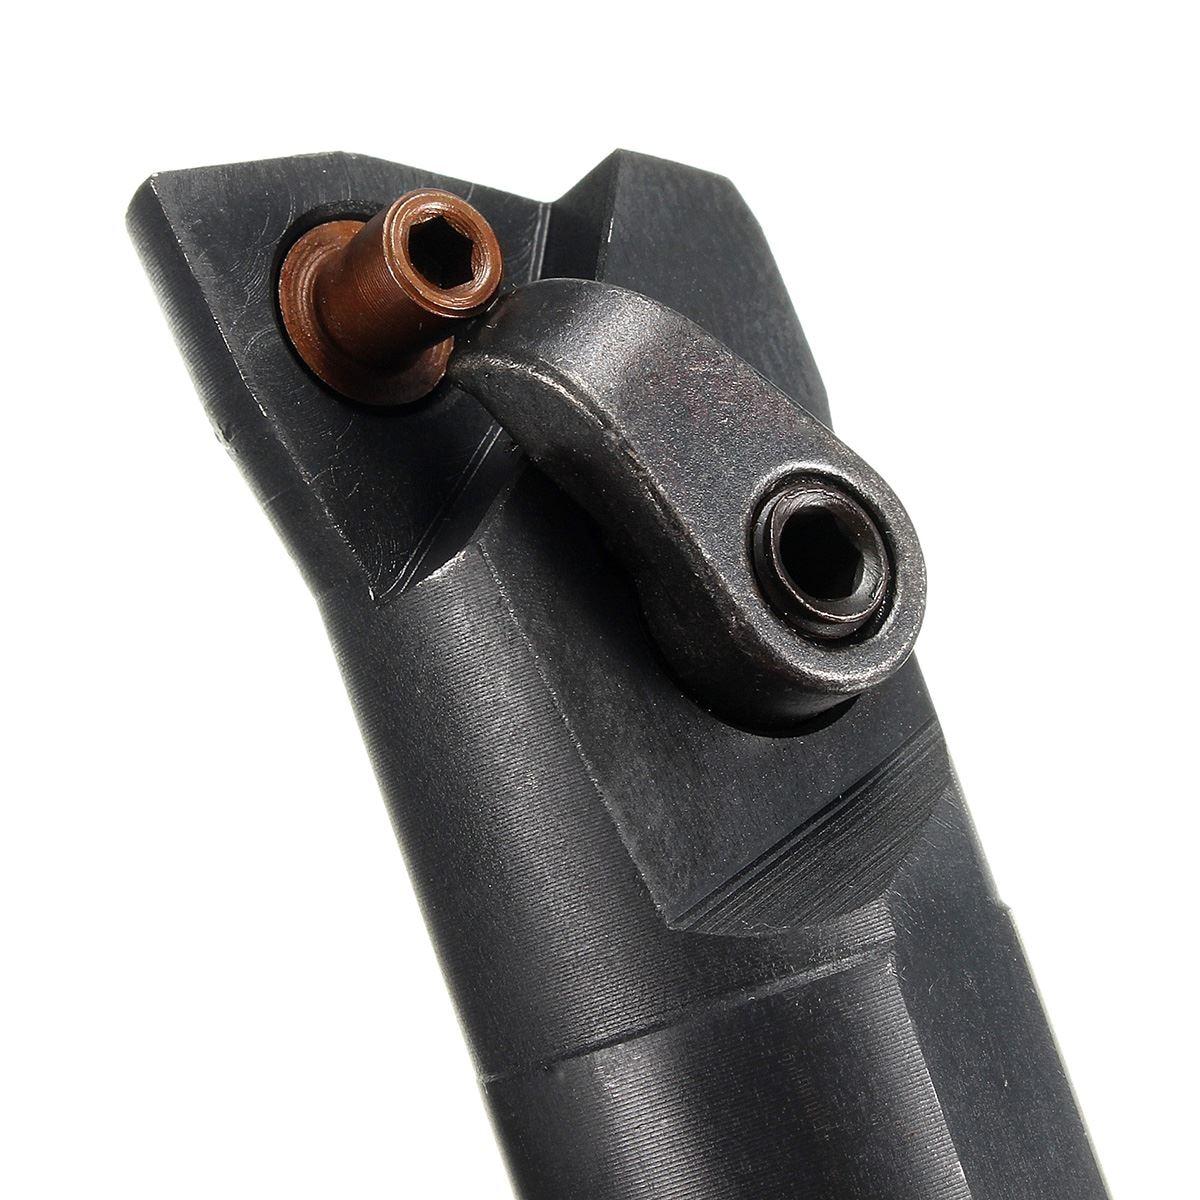 20x200mm 95 Degree S20R-MWLNR08 Internal Turning Tool Boring Bar Holder CNC Lathe For WNMG0804 new arrival snr0008k11 internal threading boring bar turning tool holder for 11 ir 1 4 cnc lathe 125mm x8mm